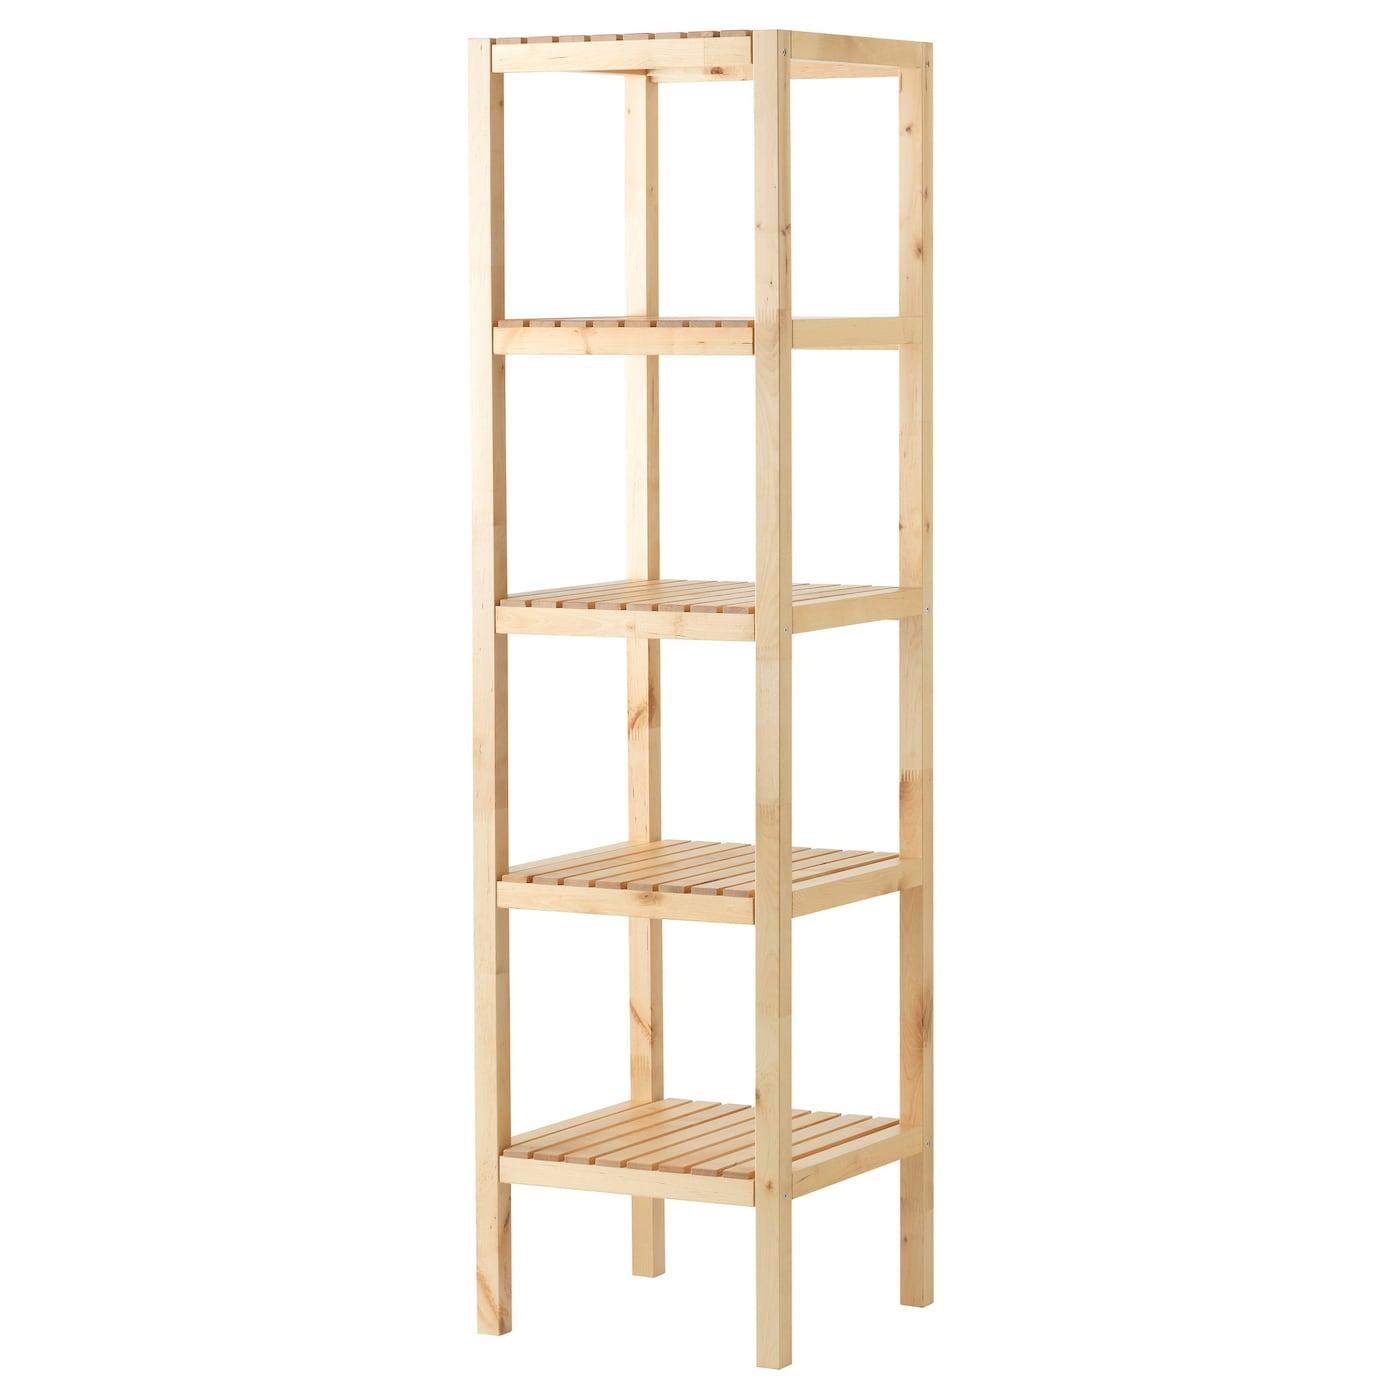 Best Ikea Kast Badkamer Images - Modern Design Ideas ...